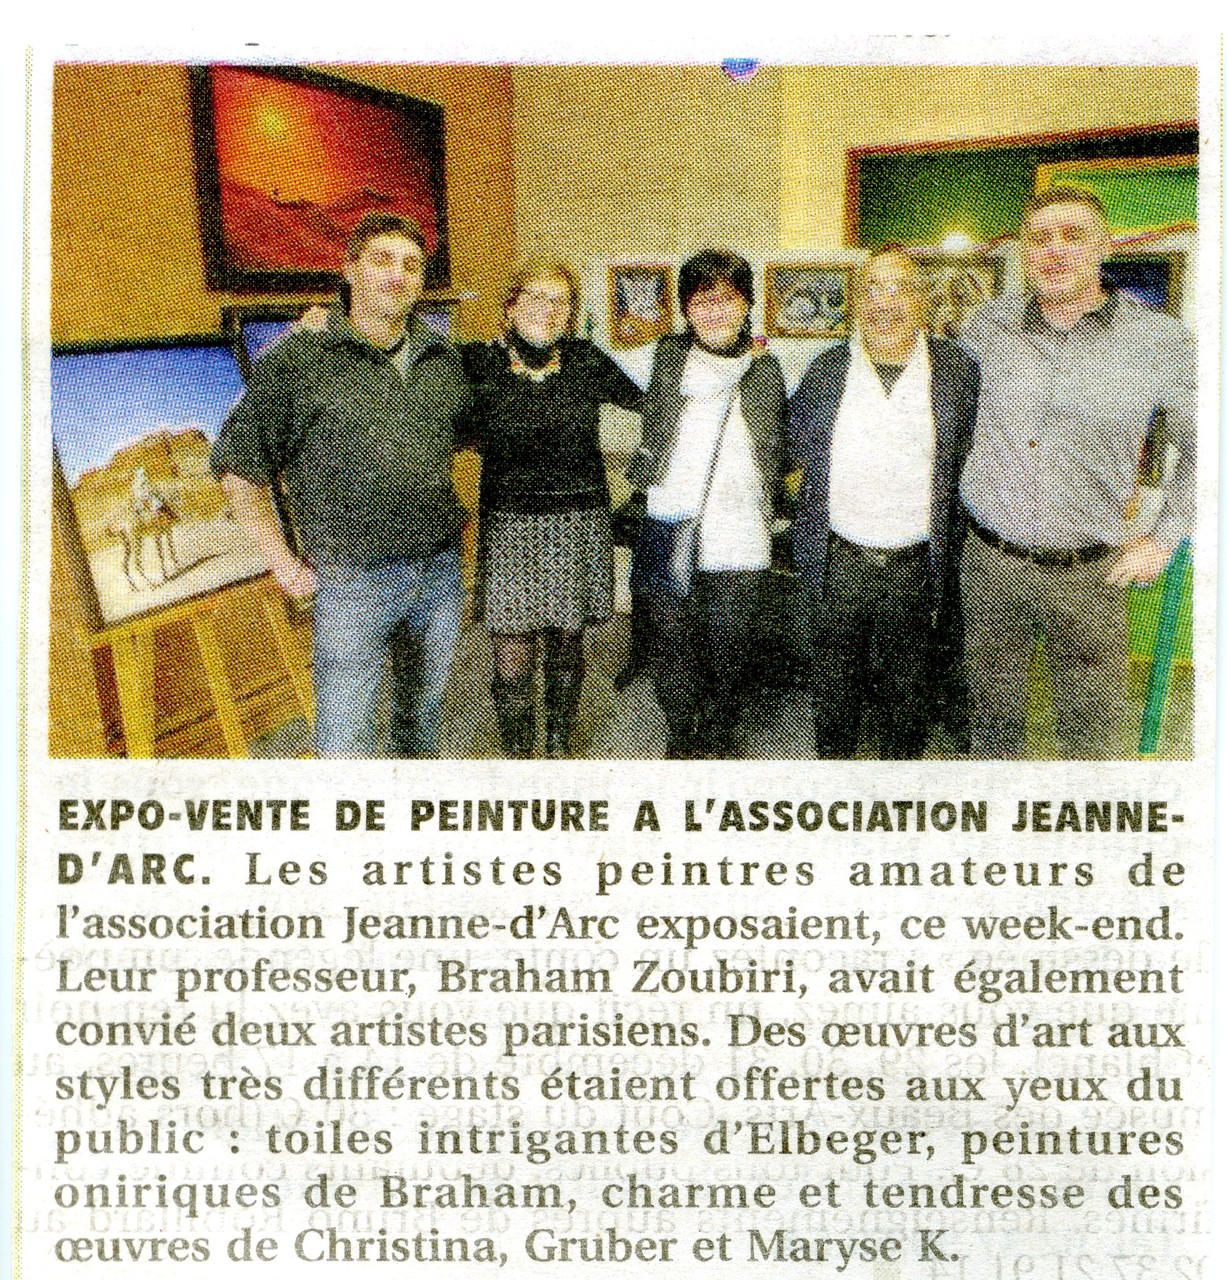 Exposition avec Braham Zoubiri et Philippe Elbeger - Chartres